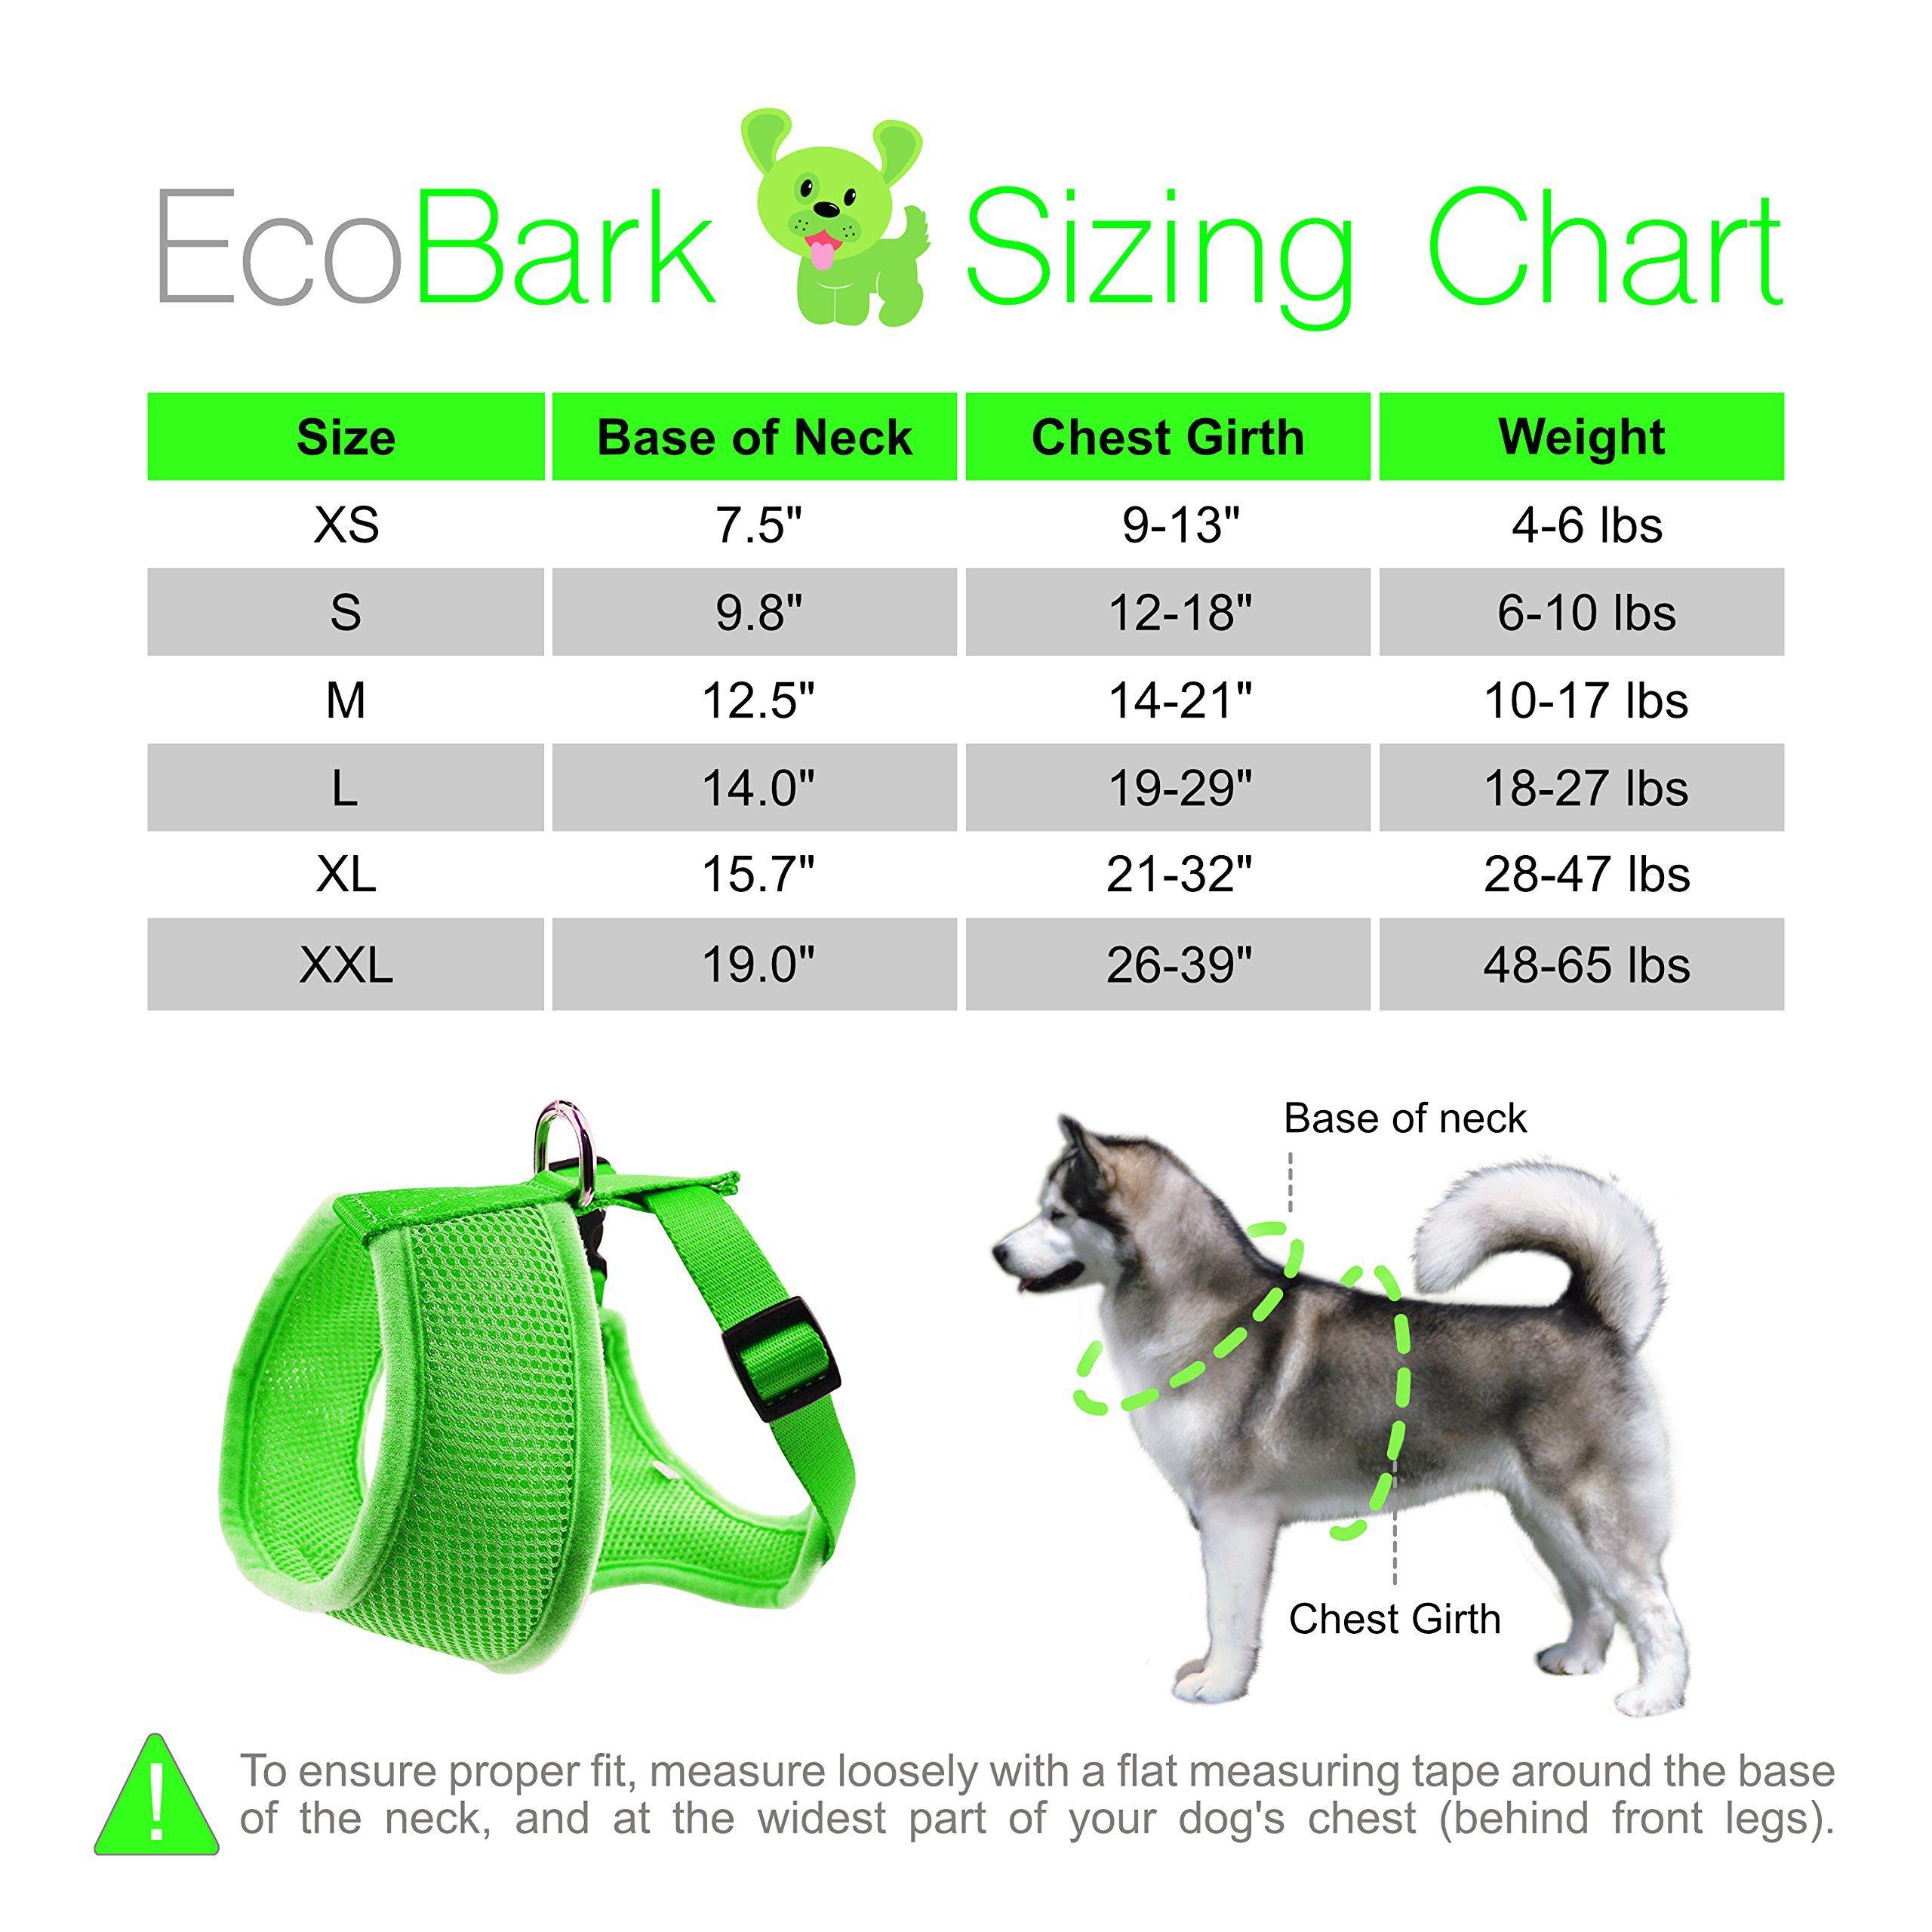 Ecobark Maximum Comfort Dog Harness 365 Lbs Innovative No Pull